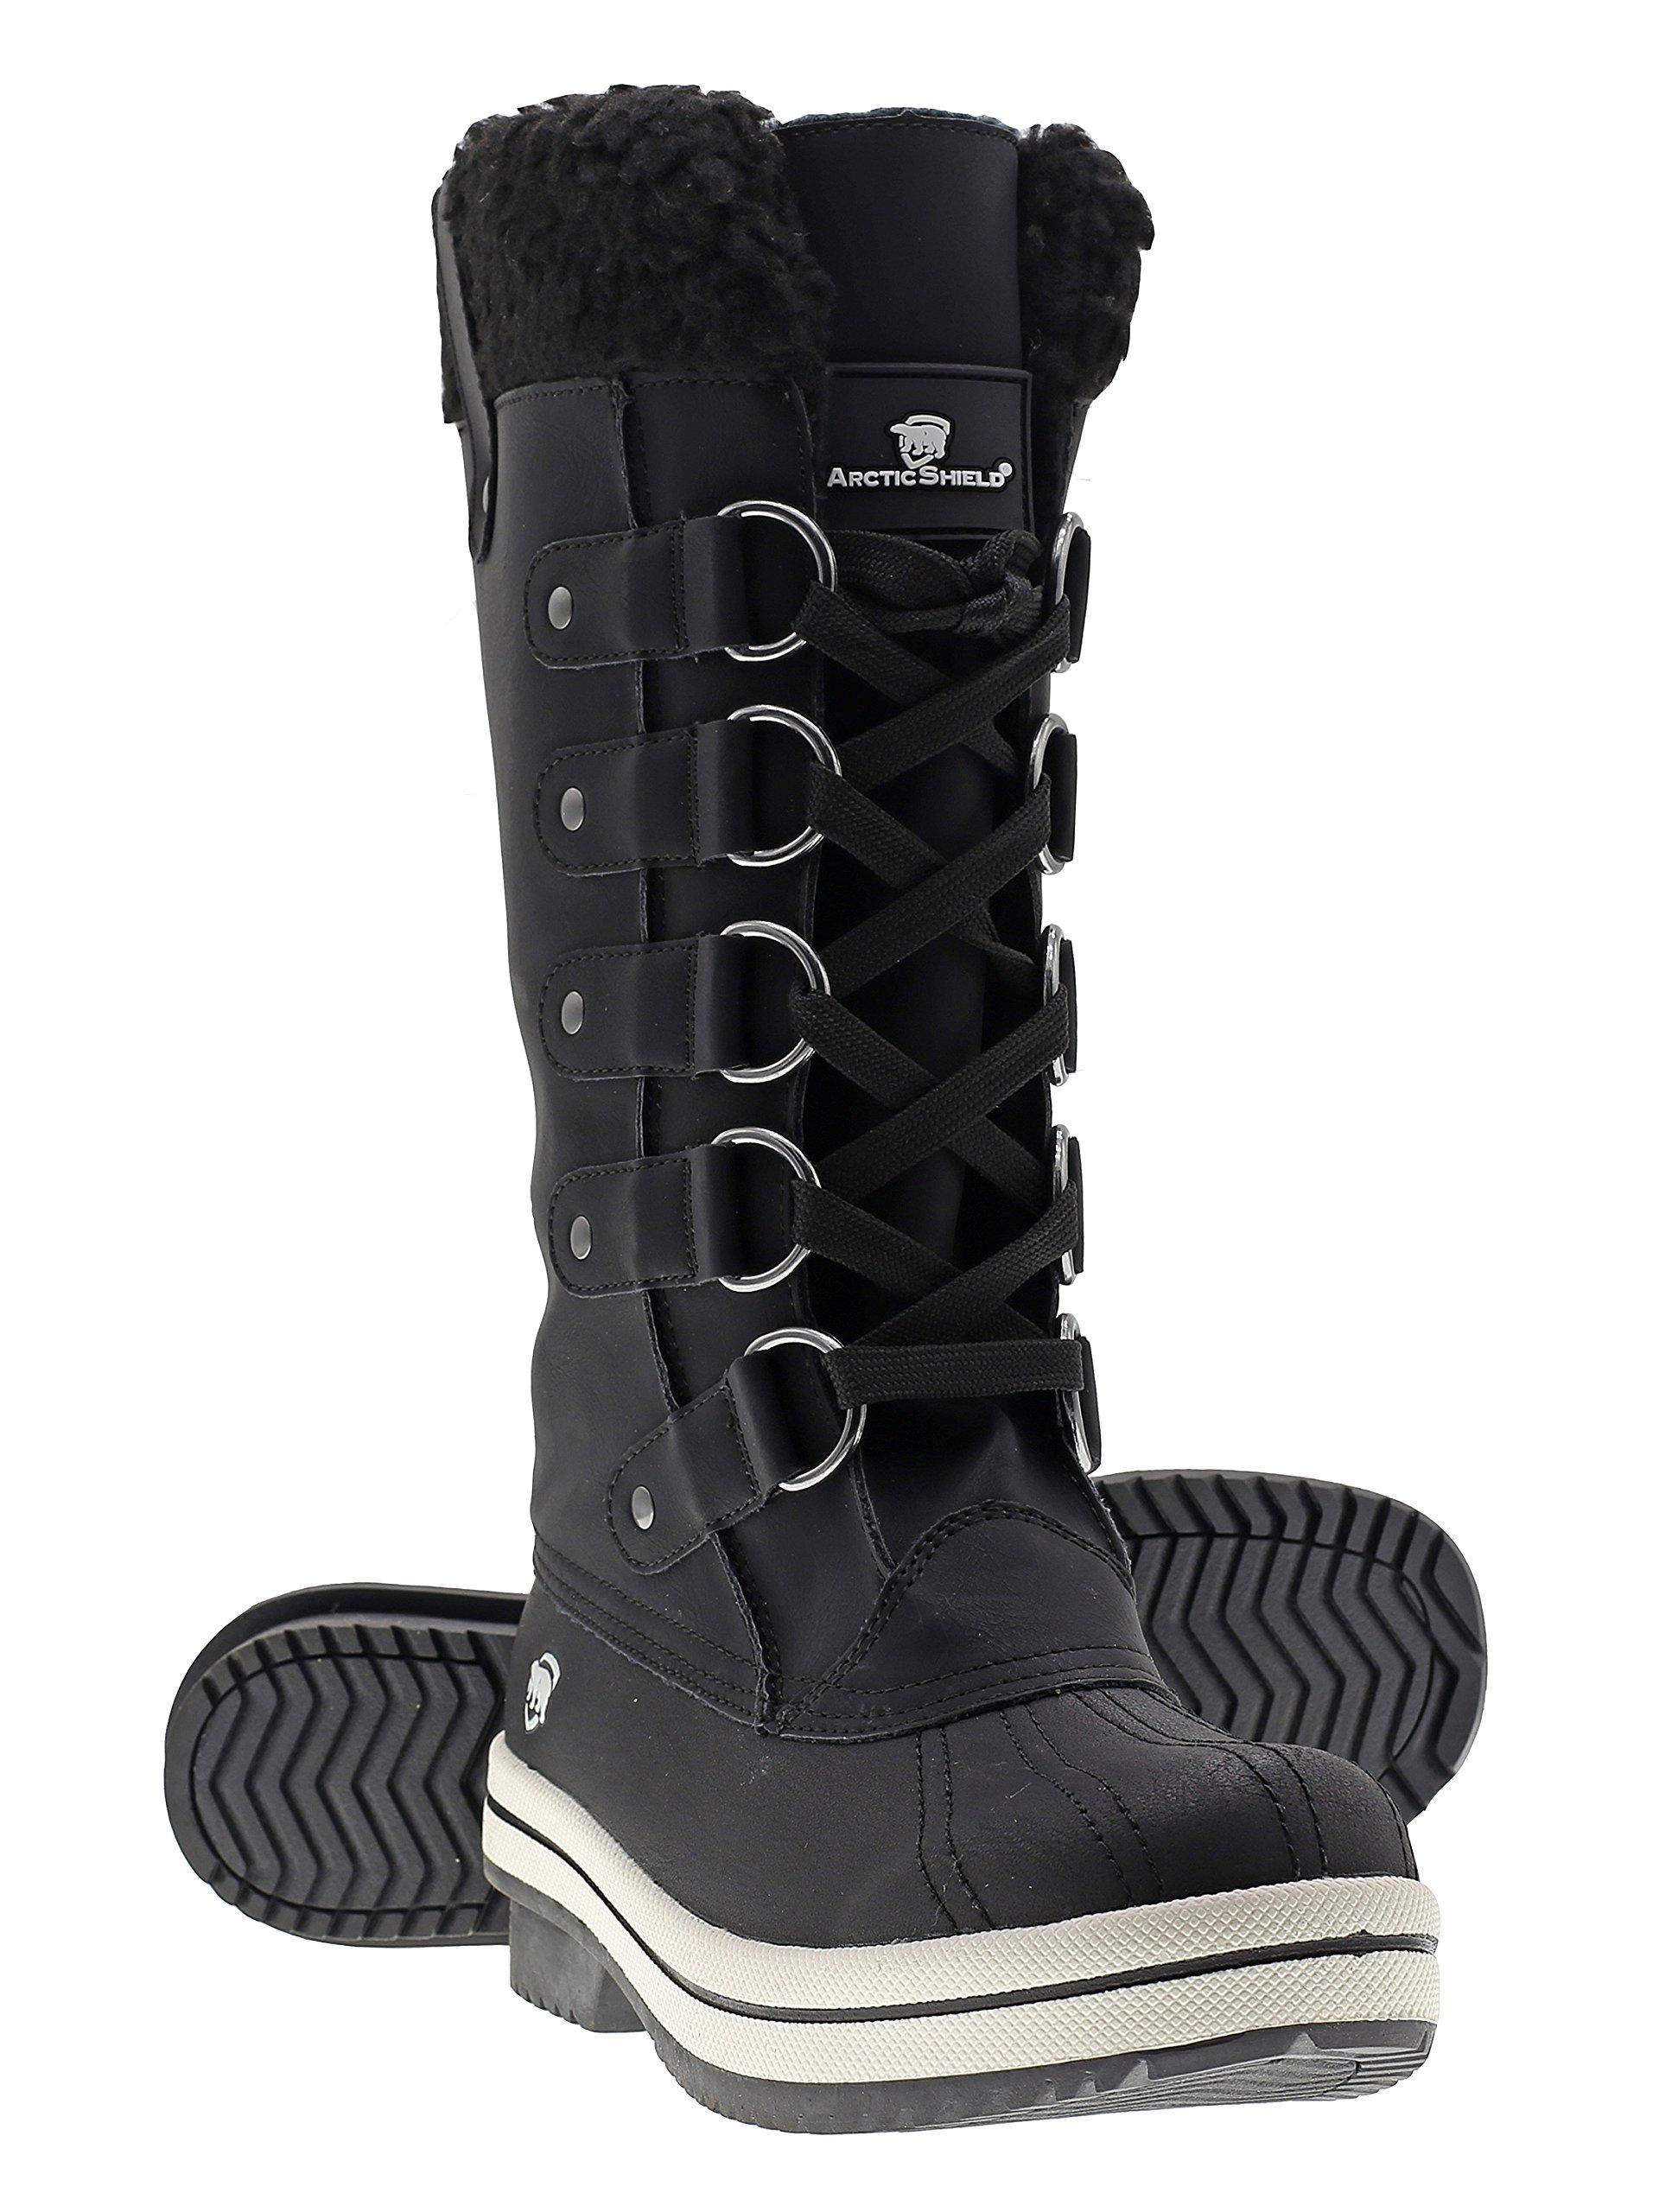 Arctic Shield Women's Warm Comfortable Insulated Waterproof Durable Outdoor Winter Snow Boots (7 US Women's, Black)